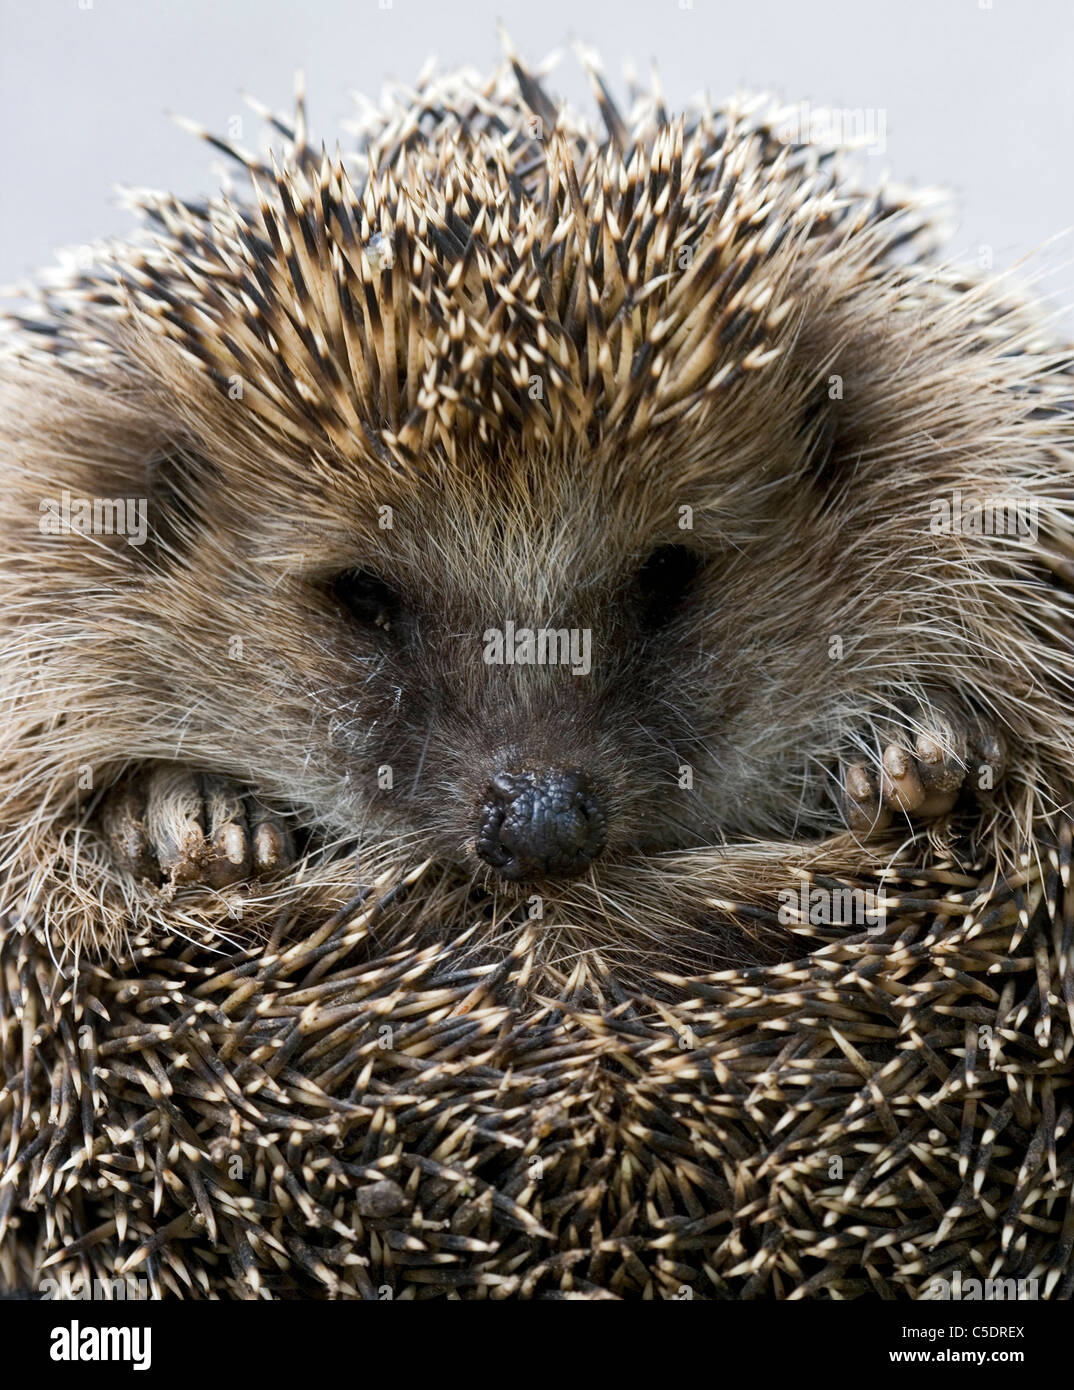 Extreme close-up of a hedgehog - Stock Image